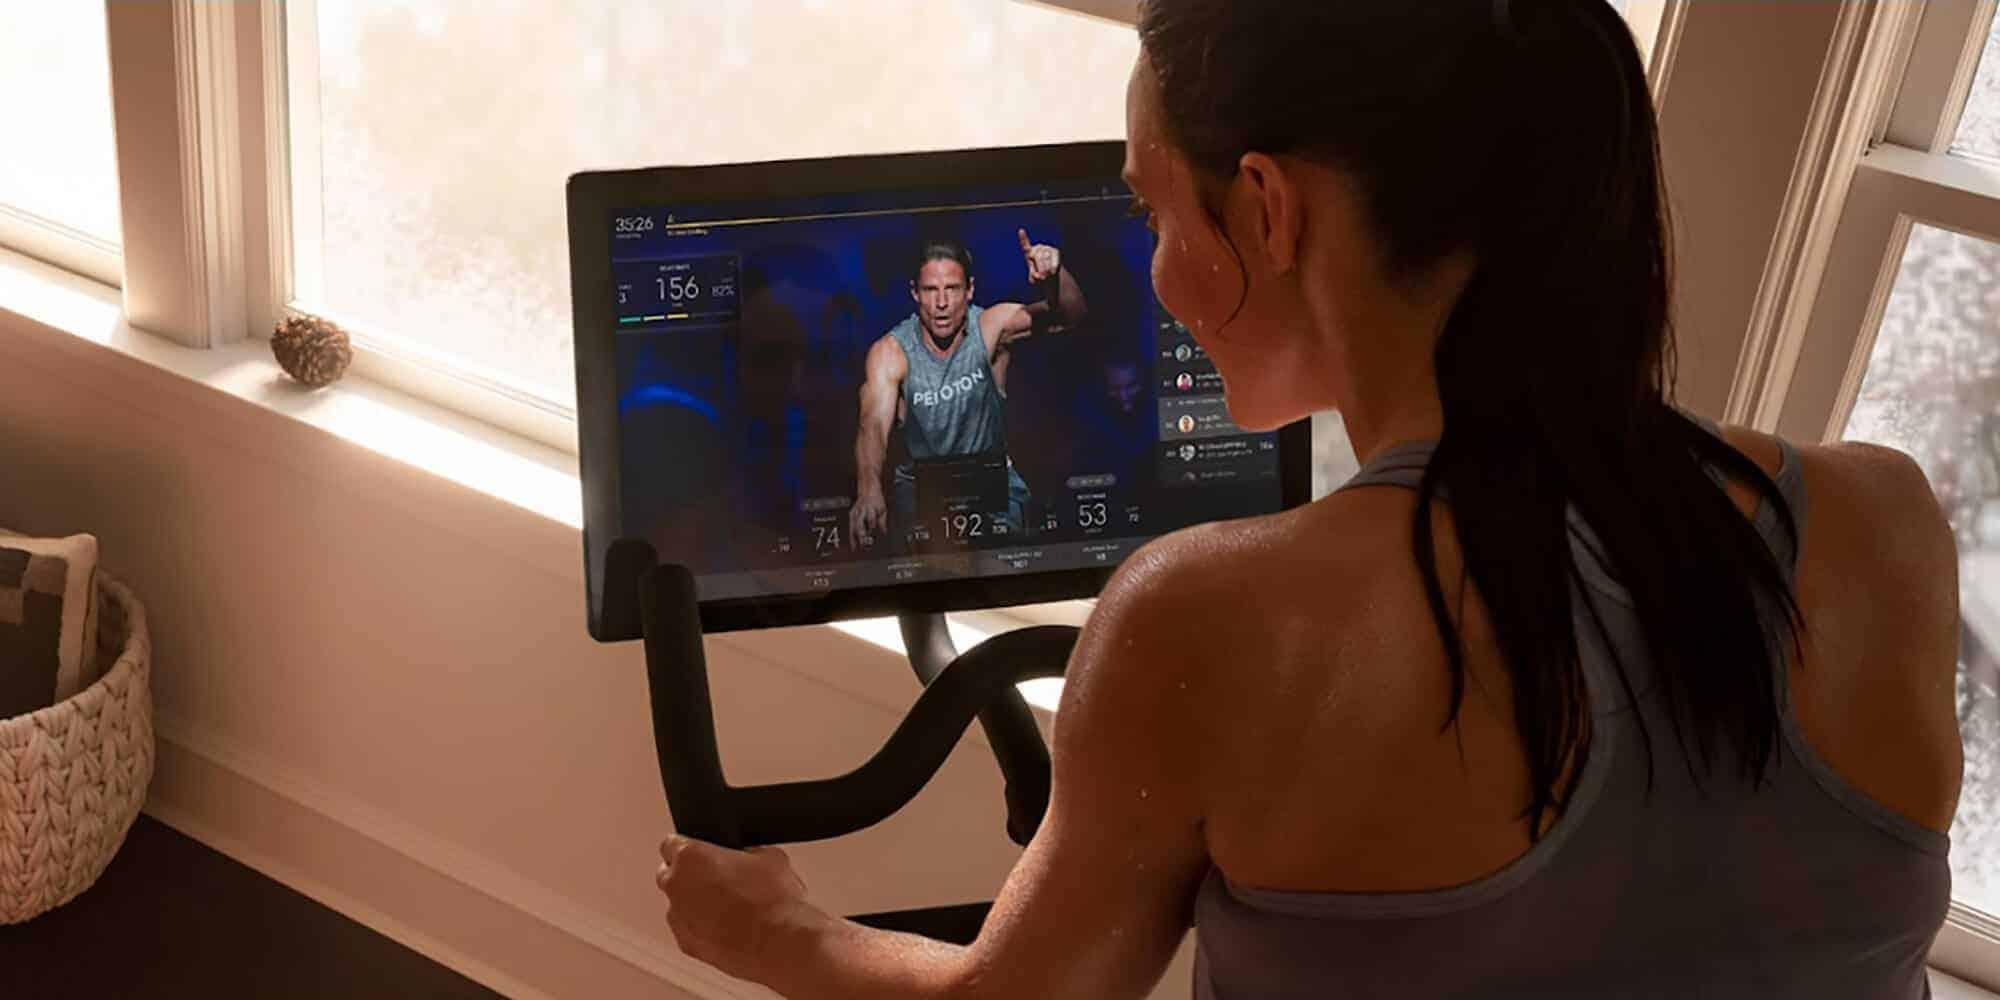 How to build a fitness tracker app like Peloton